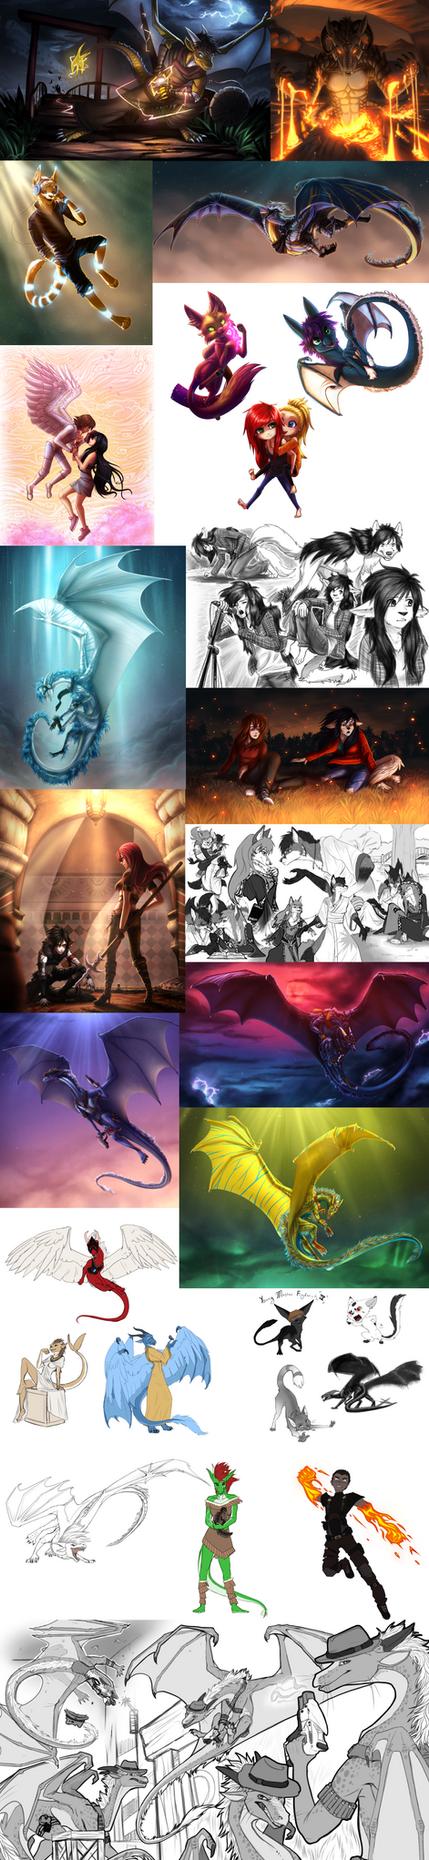 Commission Batch #1 by Ilkyra